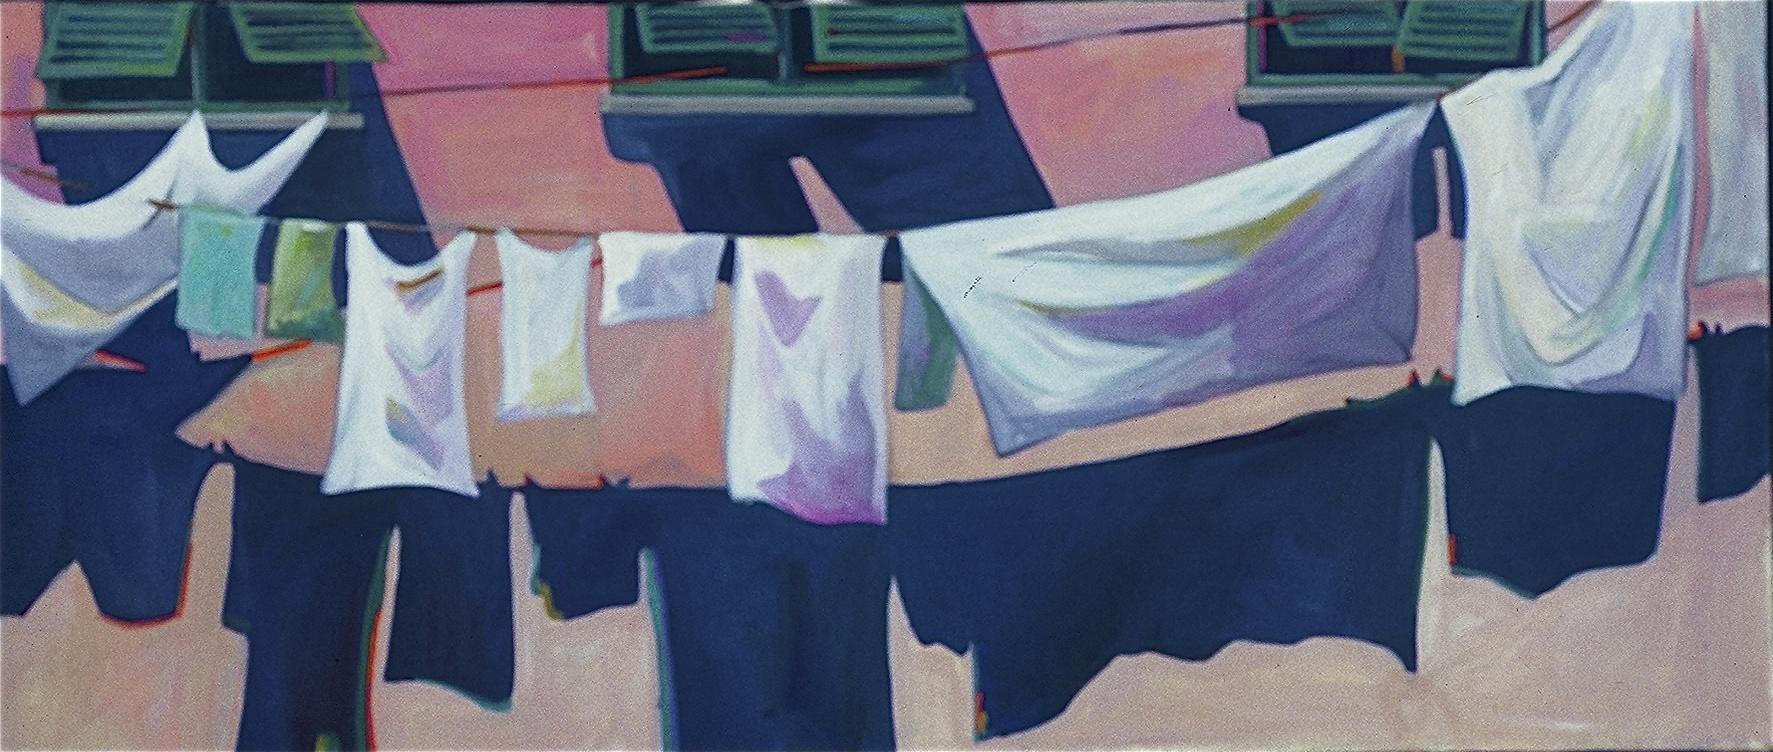 Days Laundry.jpg